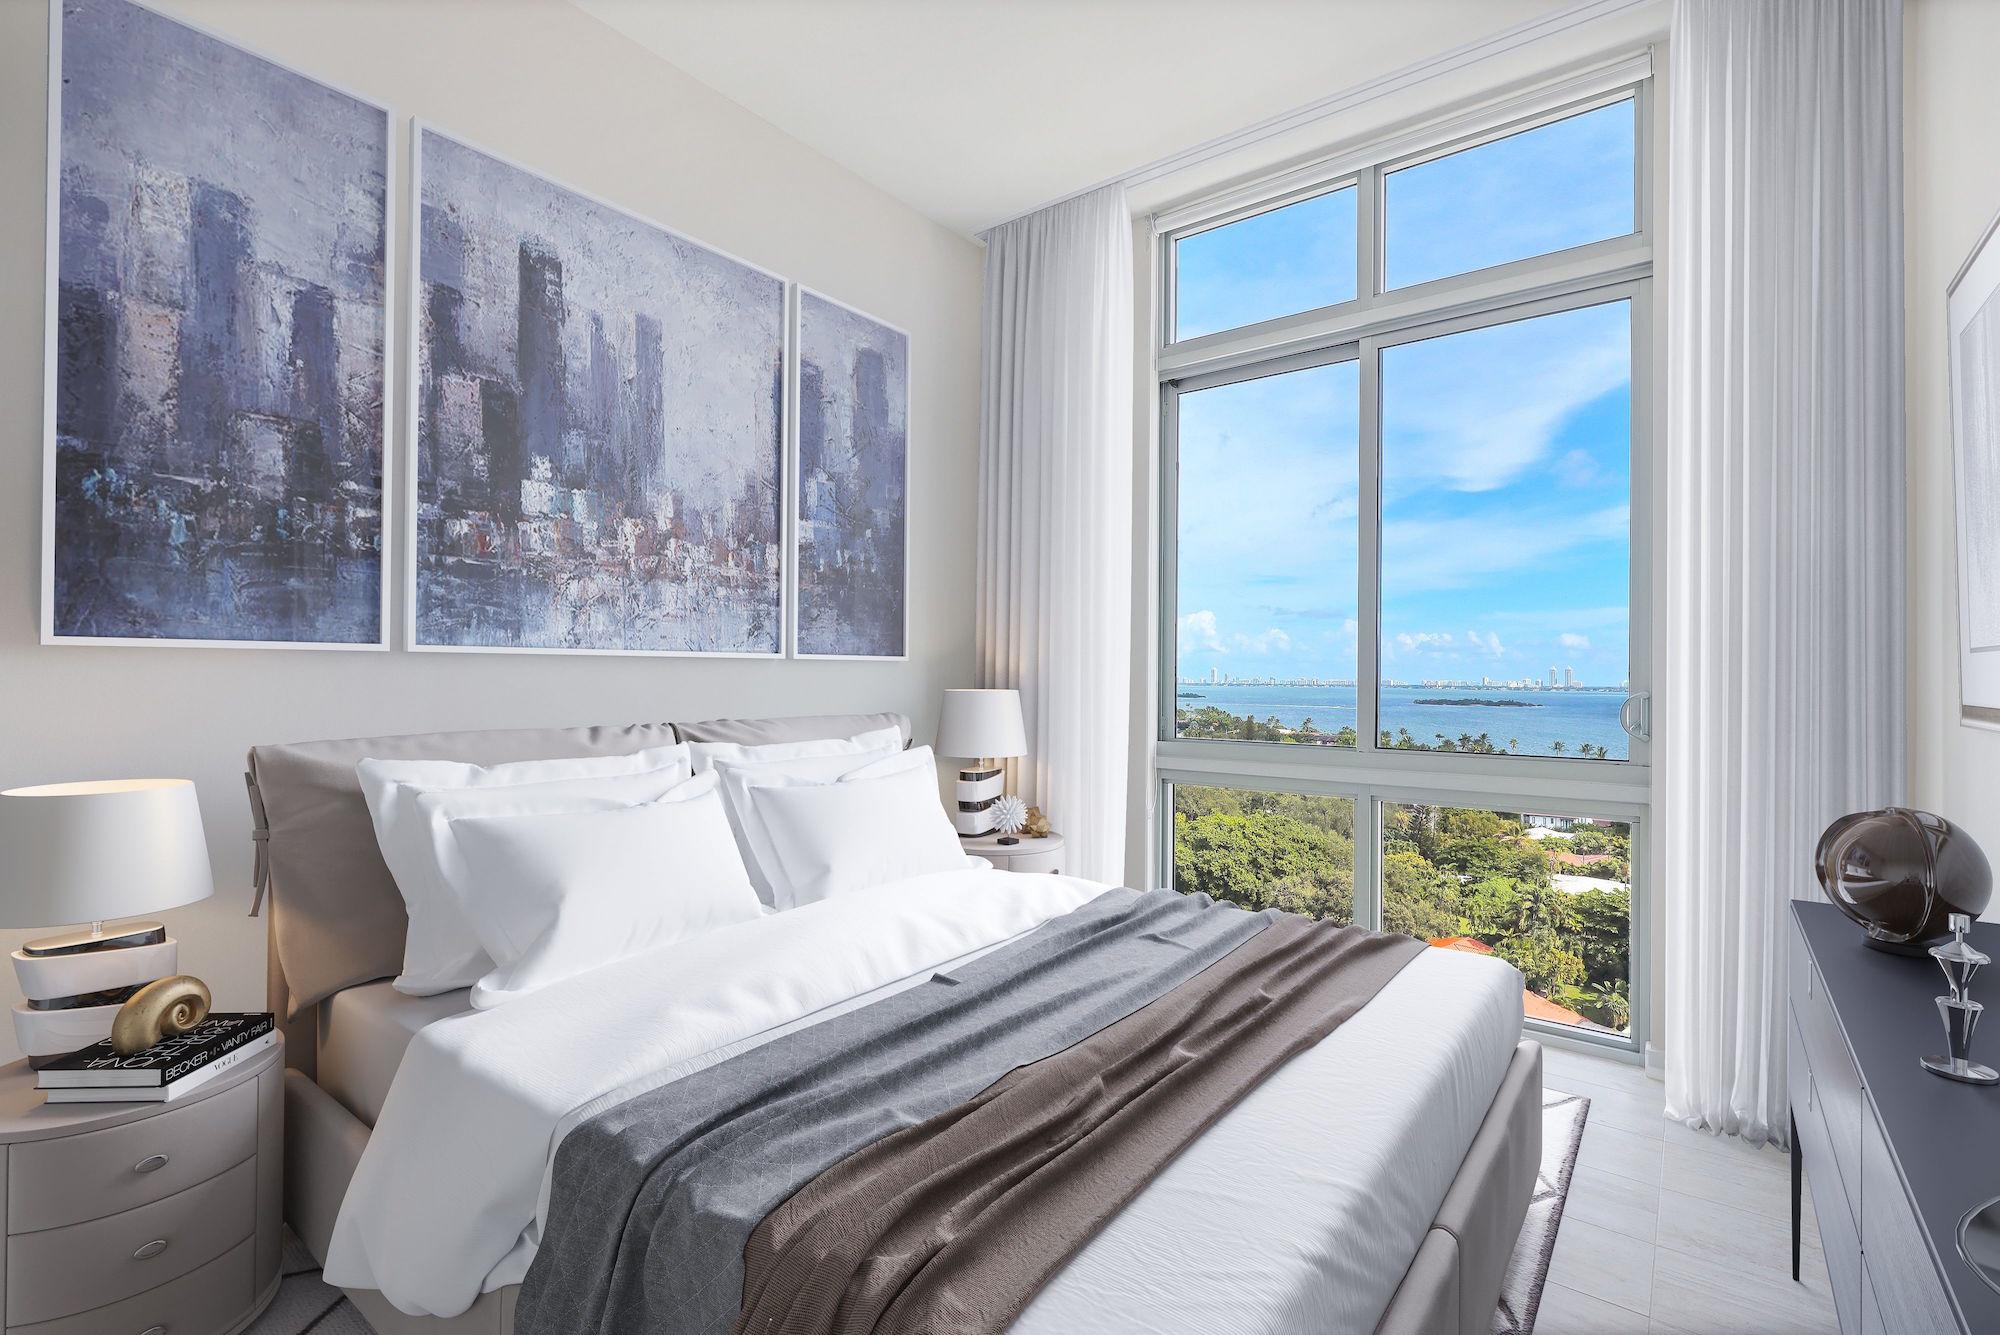 Quadro at Miami Design District - bedroom